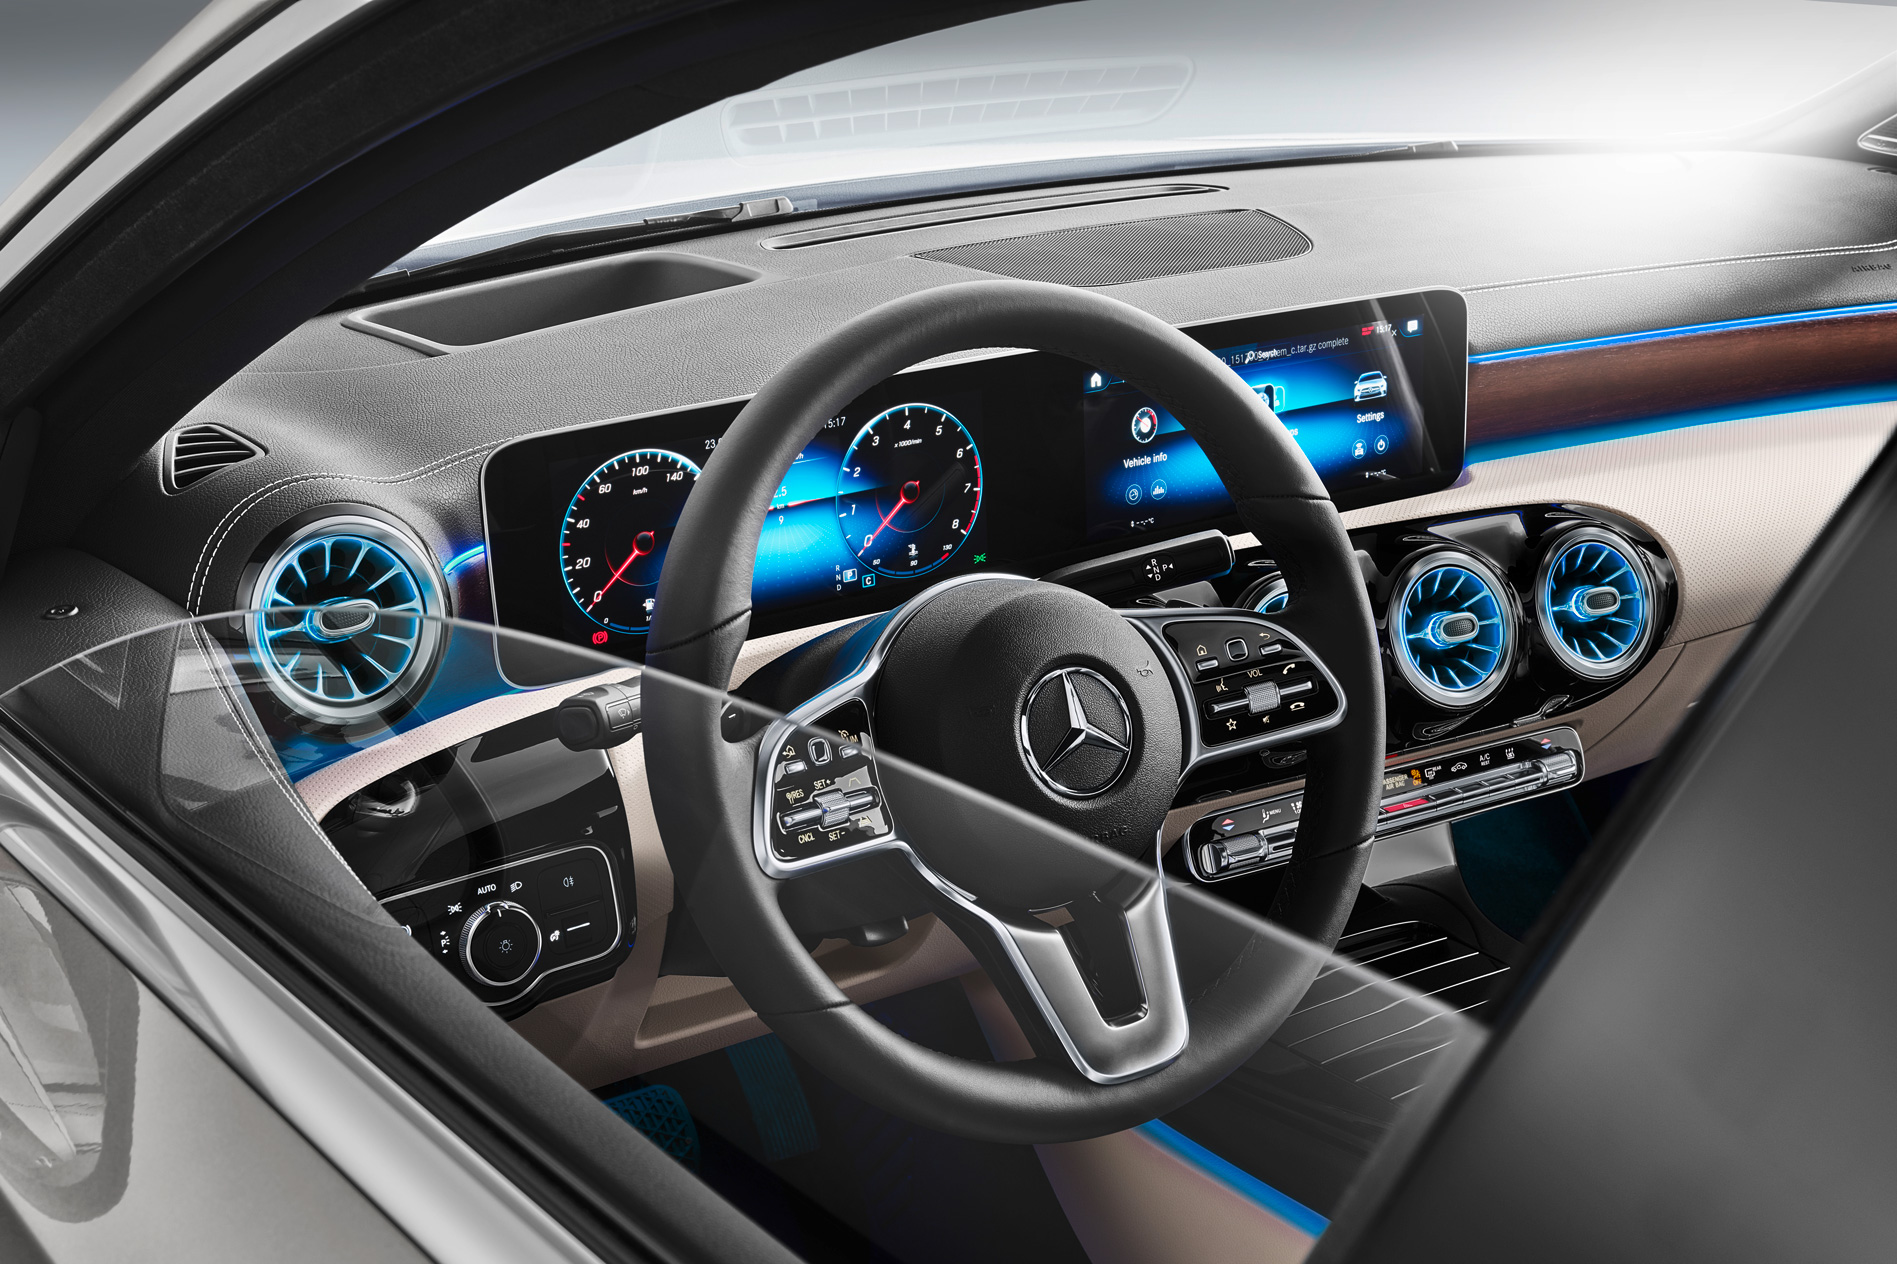 Mercedes Benz Announces A Class Sedan For Global Markets The Auto